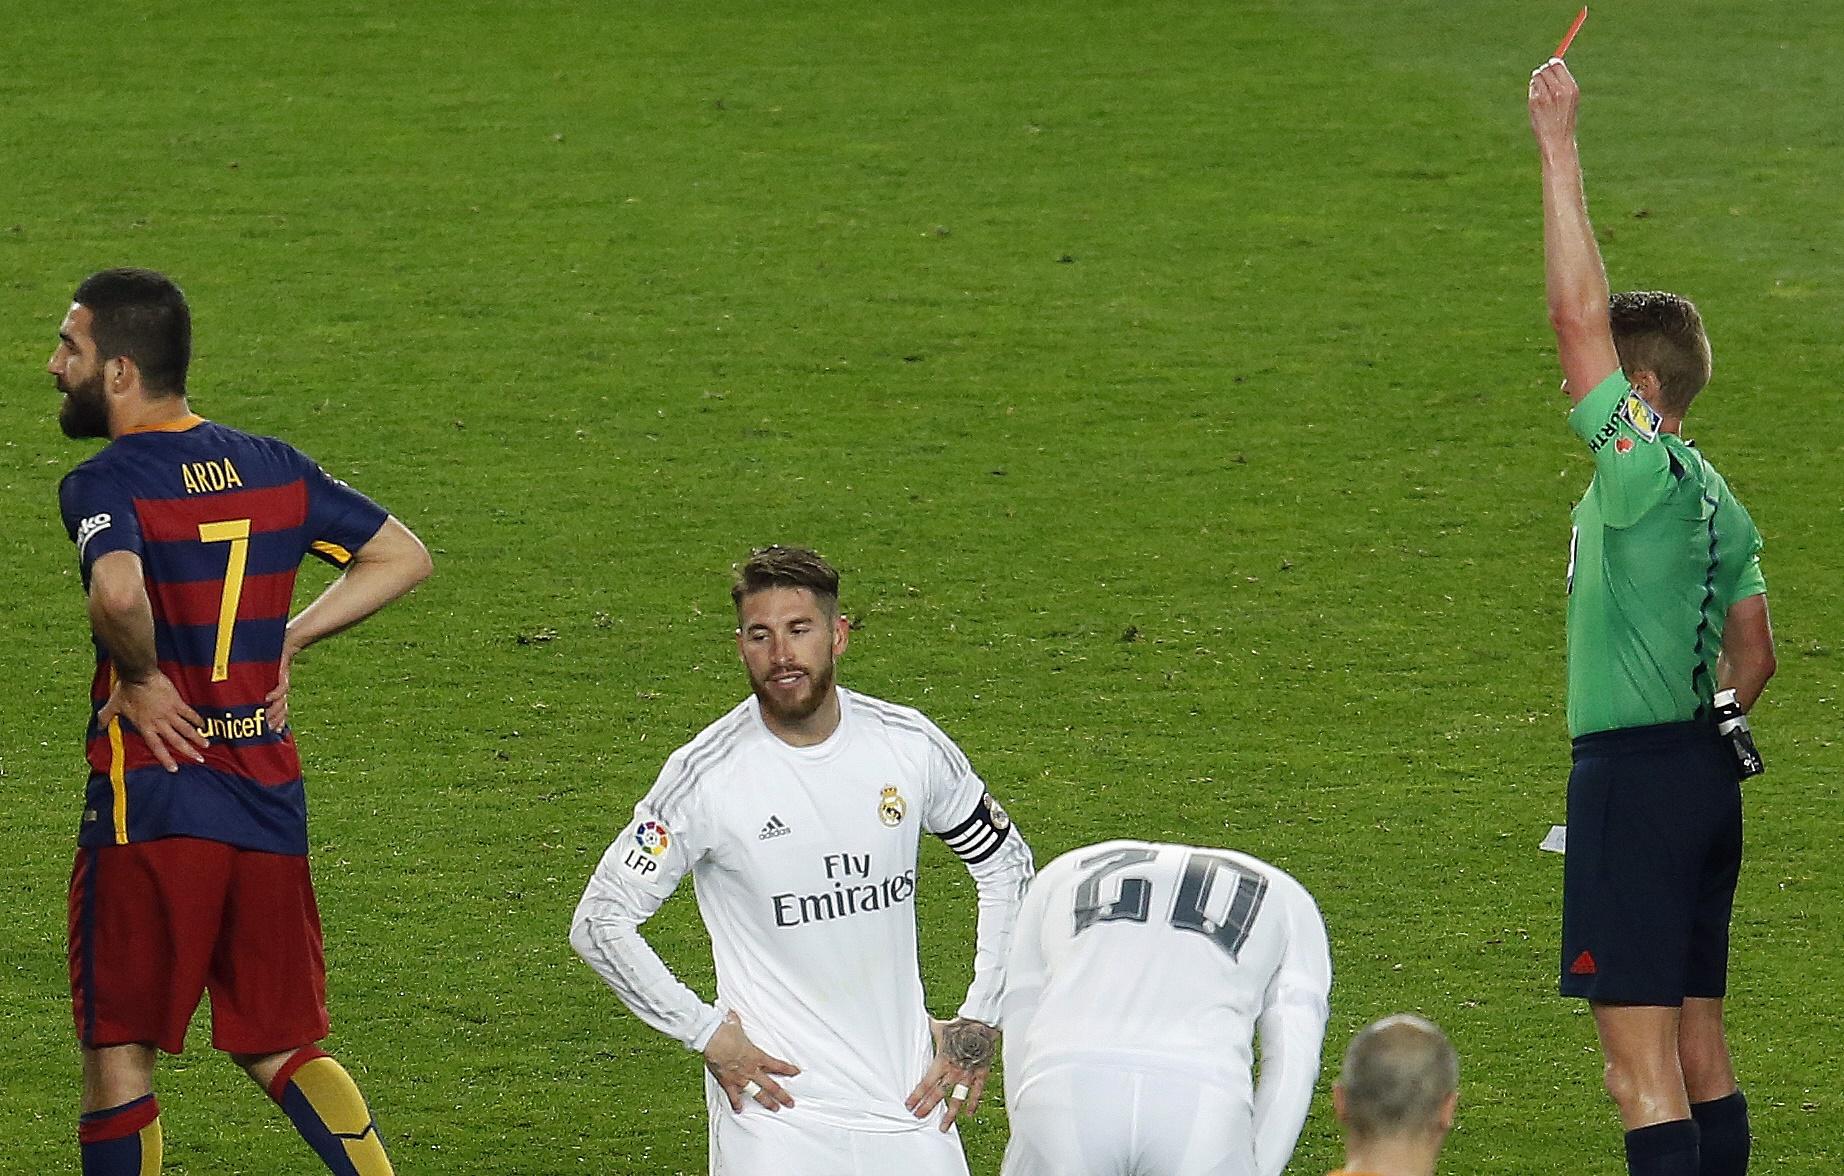 Sergio Ramos got red card against Barca